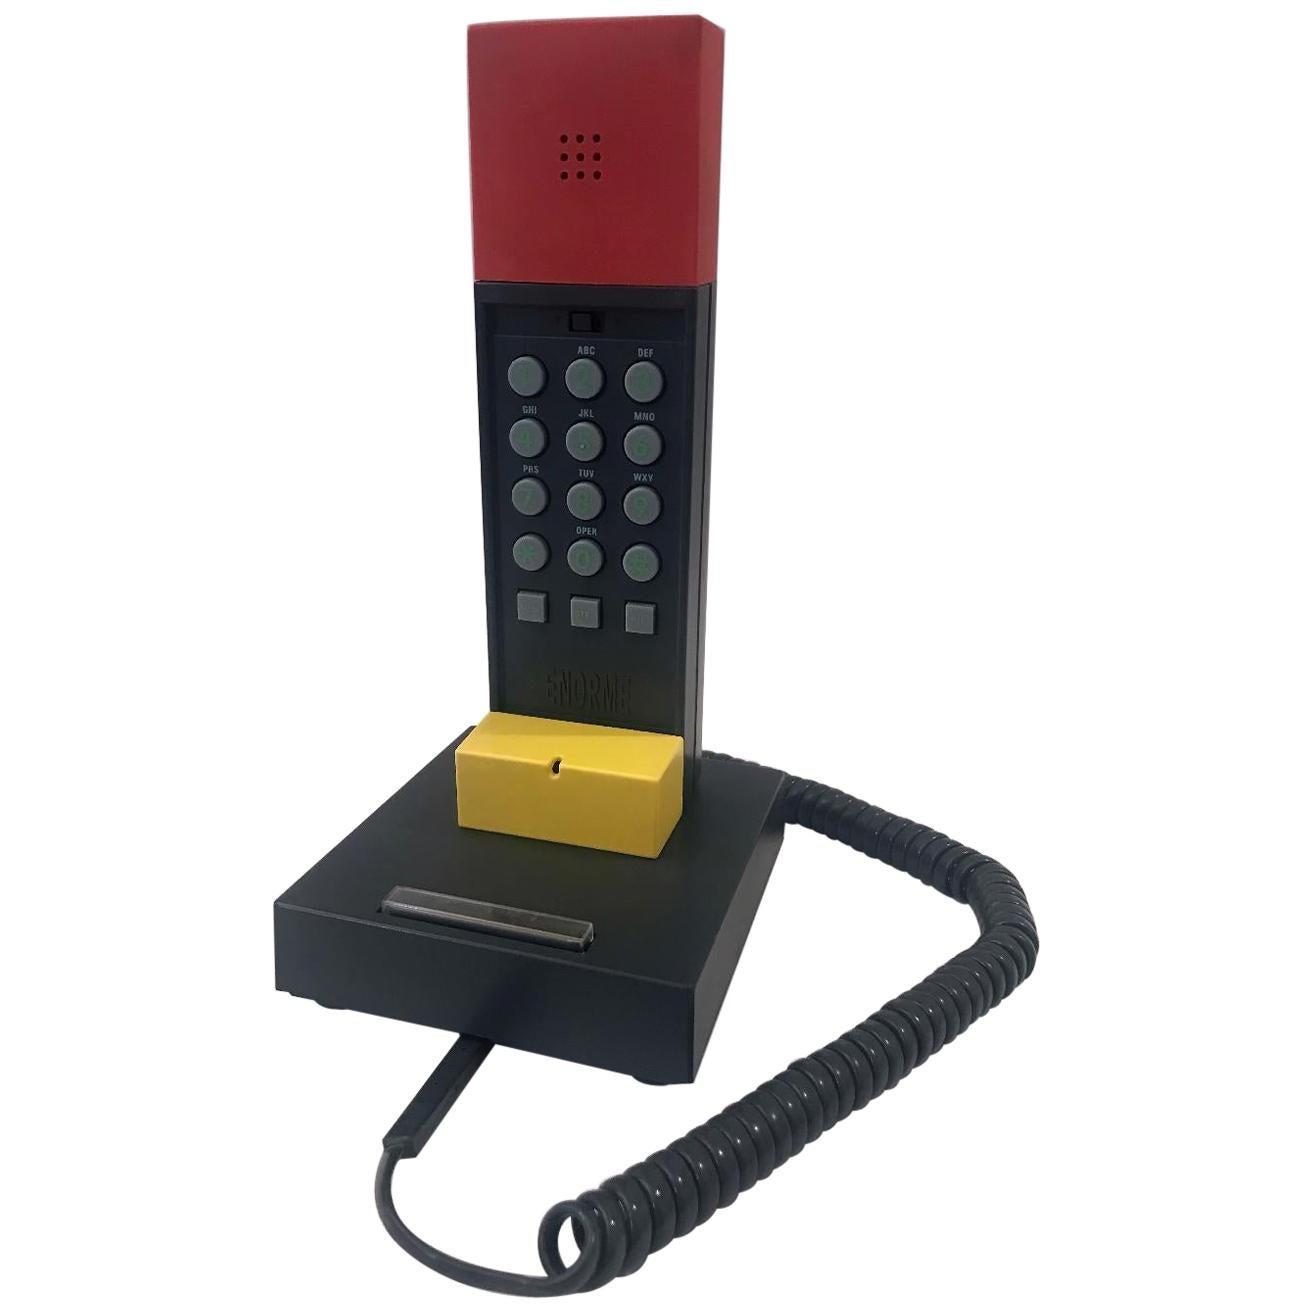 Ettore Sottsass Enorme Telephone